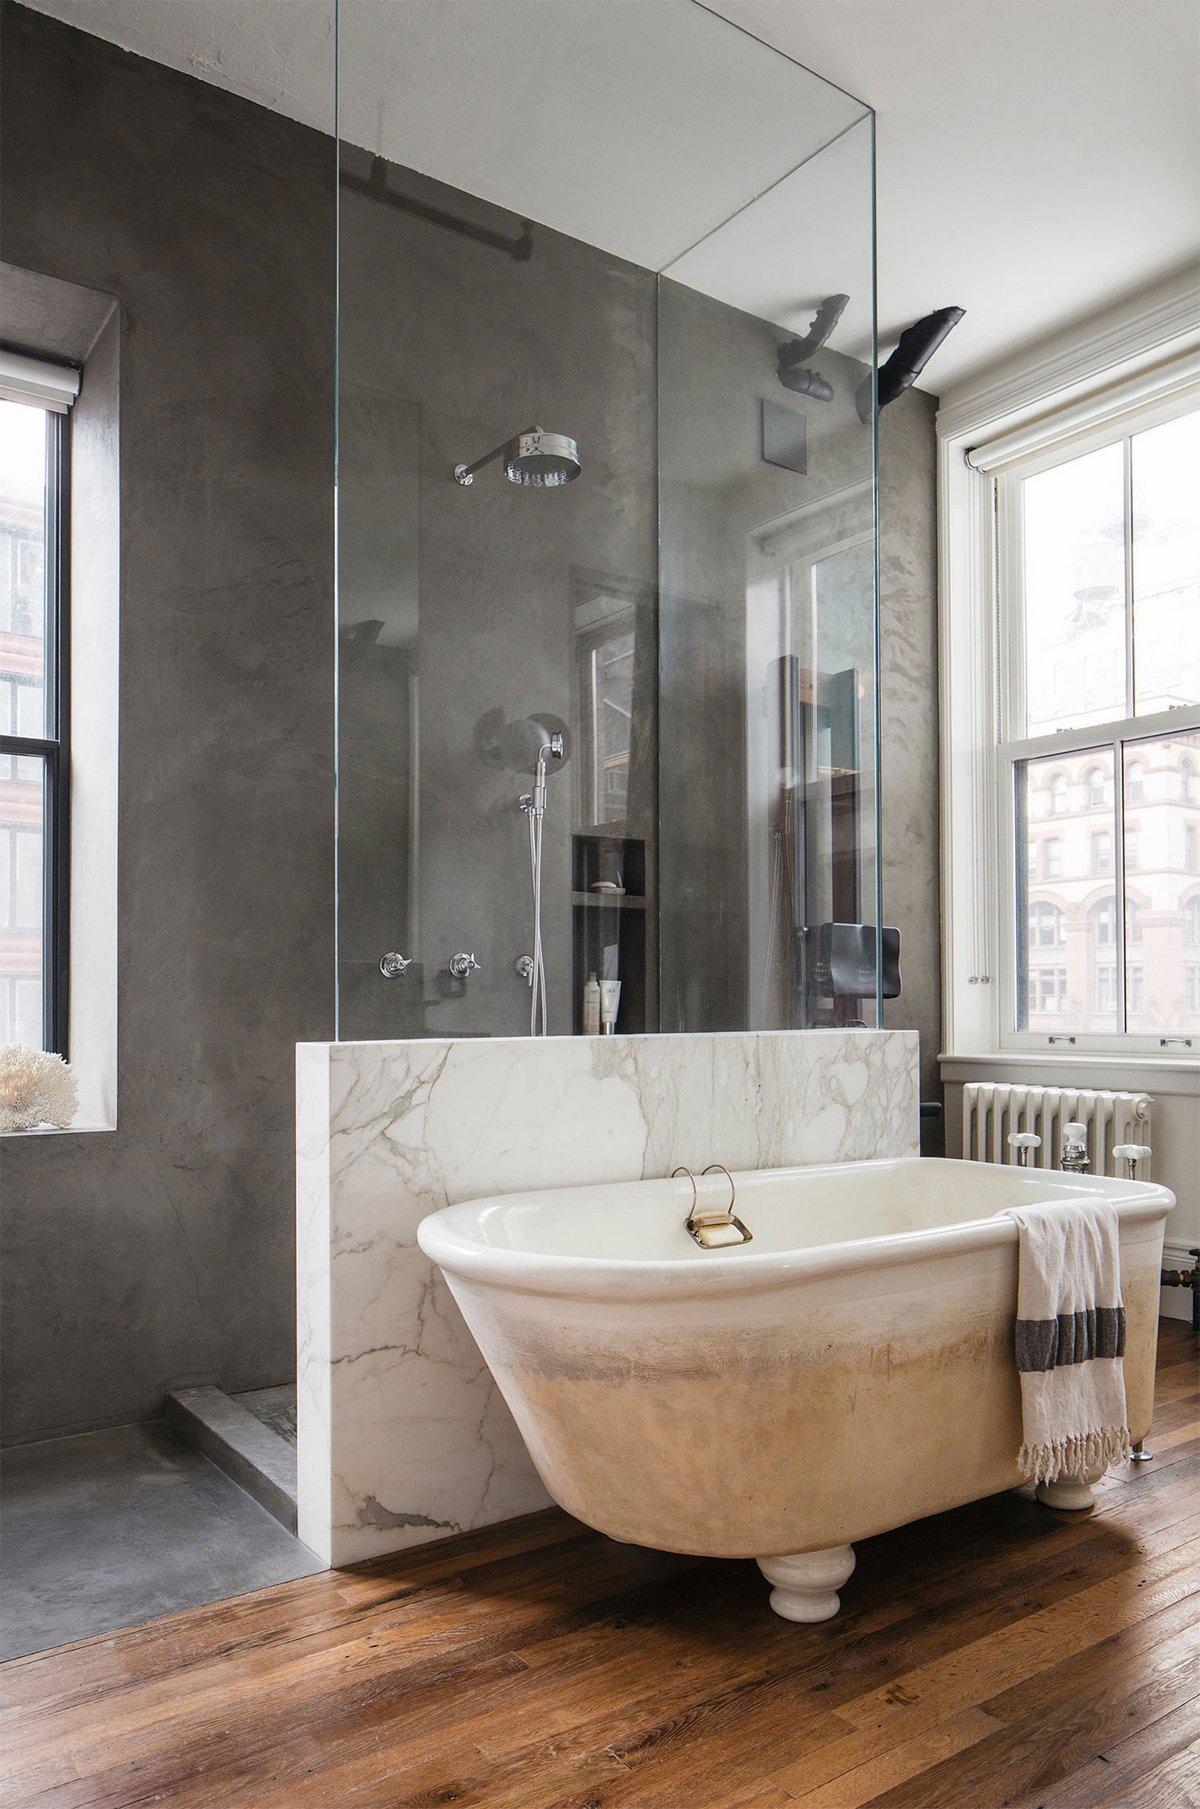 Ванна и душевая кабина в квартире